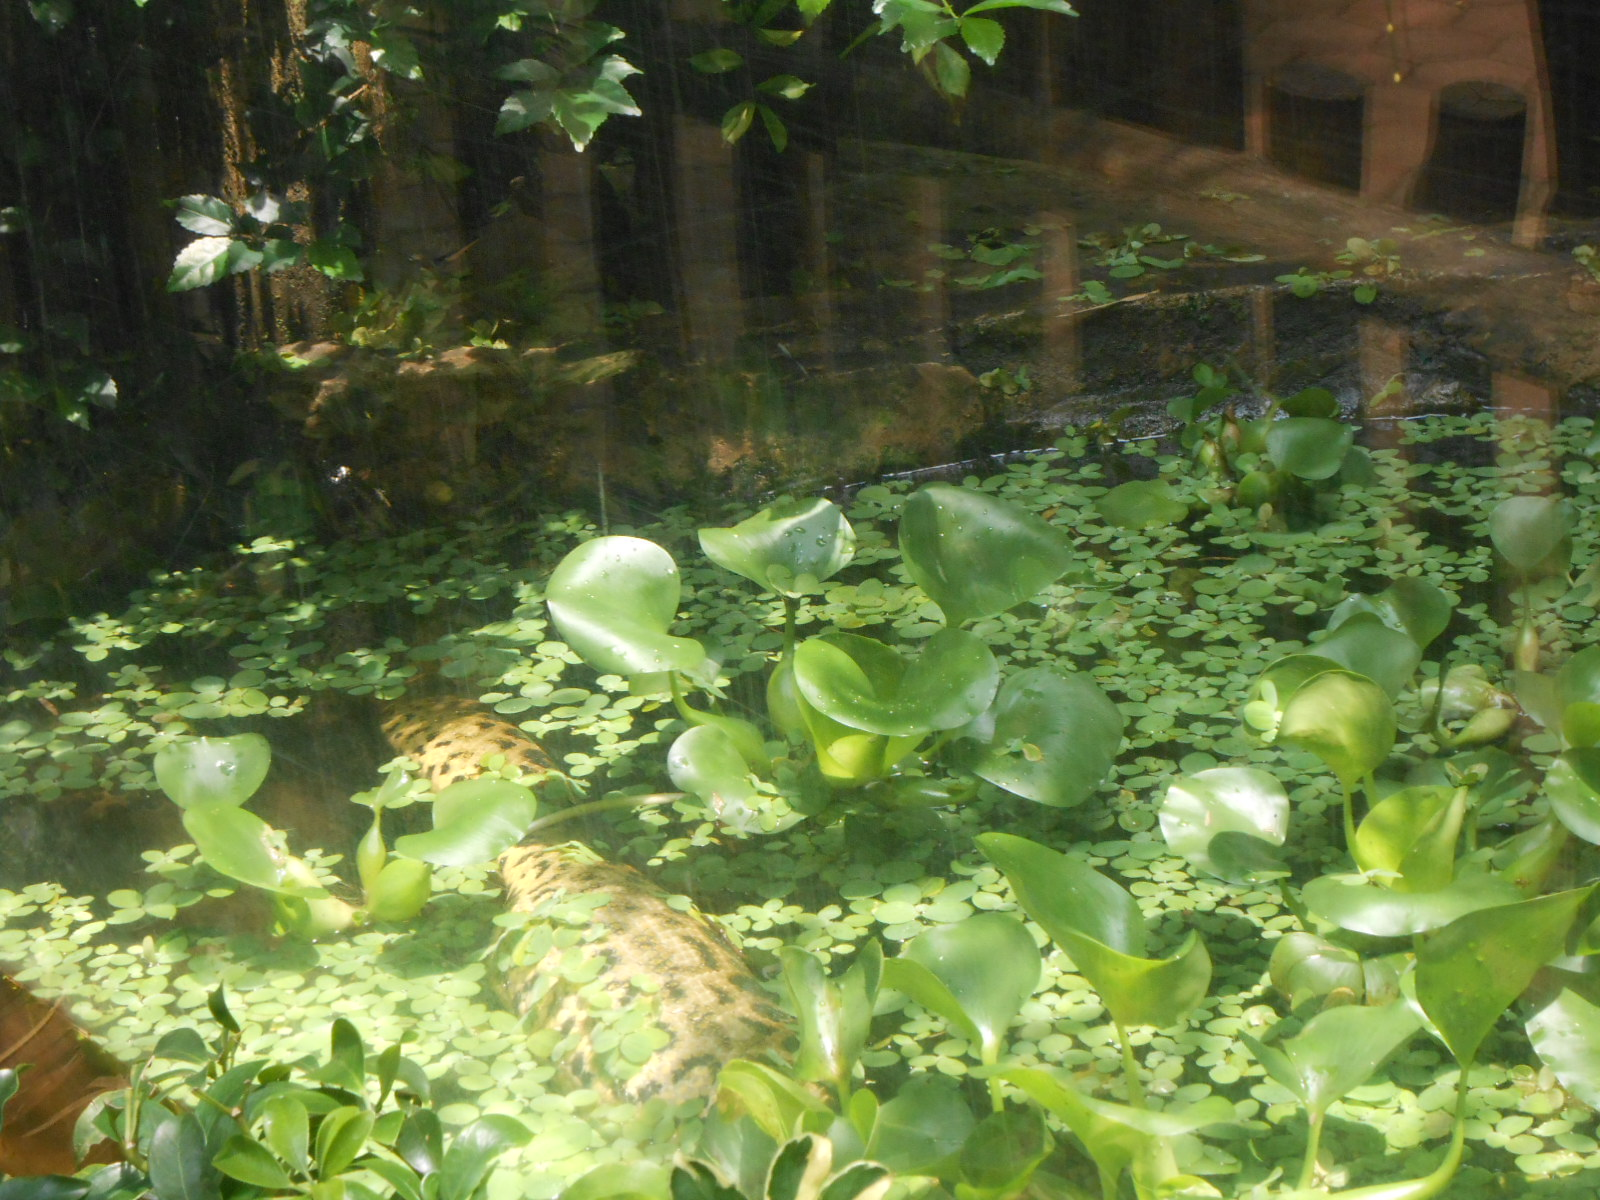 Der Zytgloggeturm 2013 Jenis Ular Koleksi Hewan Kebun Binatang Bandung